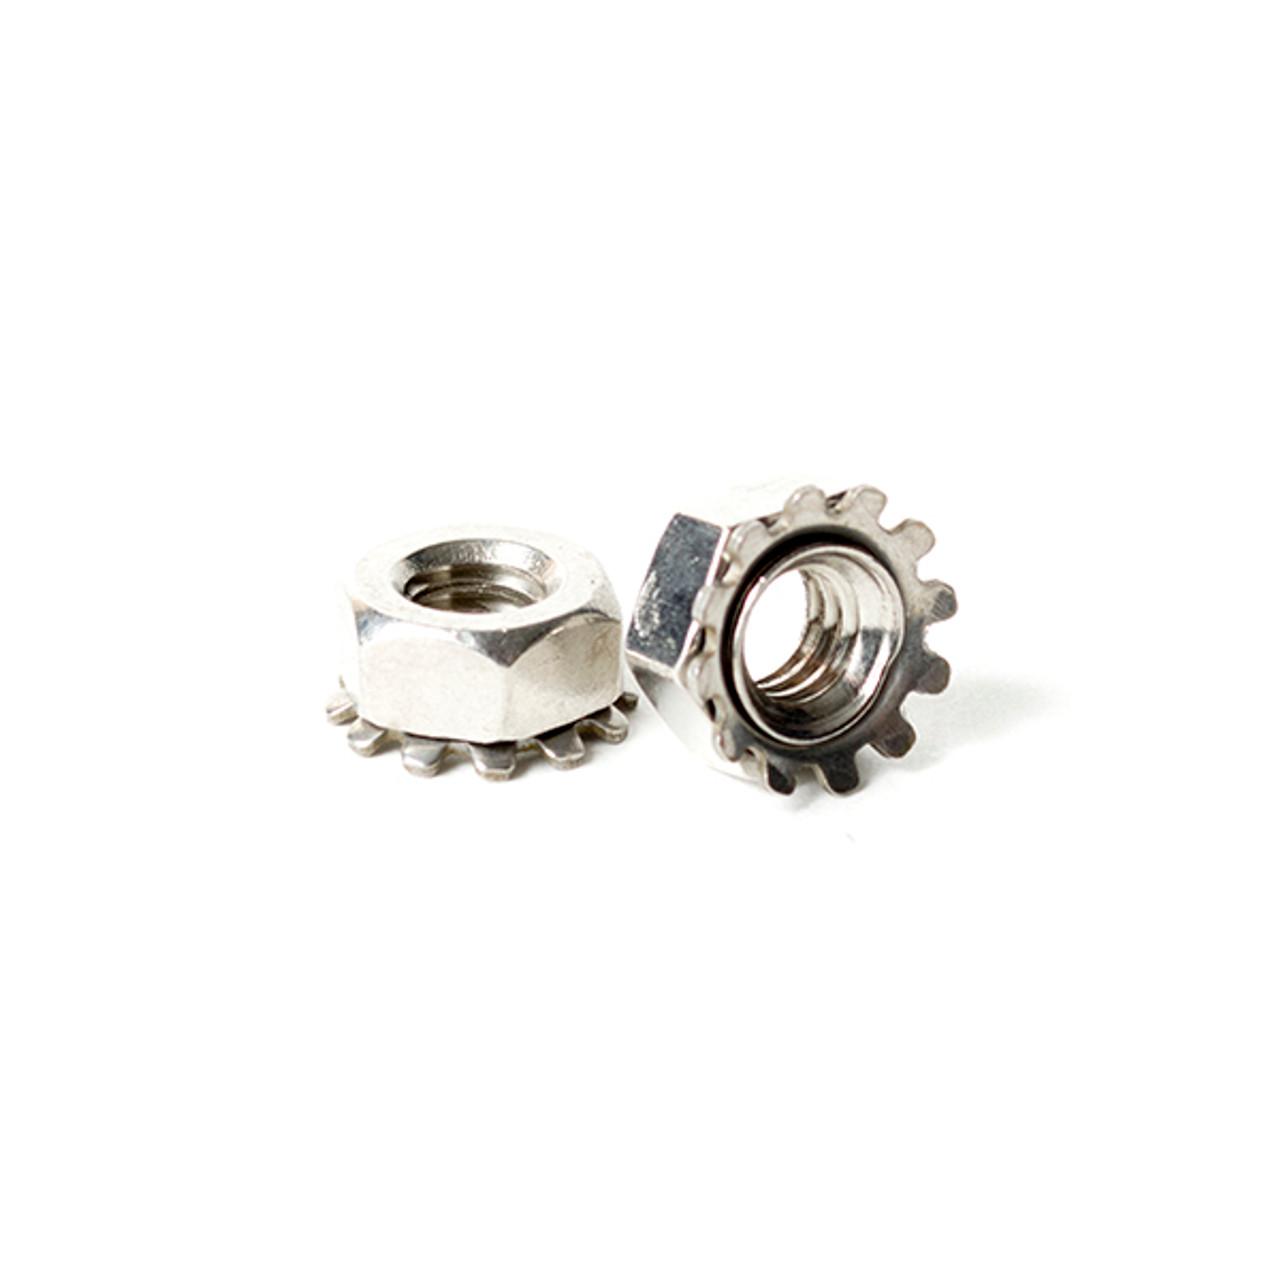 Stainless Steel 10-32 Keps Nuts K-Locks Qty 1000